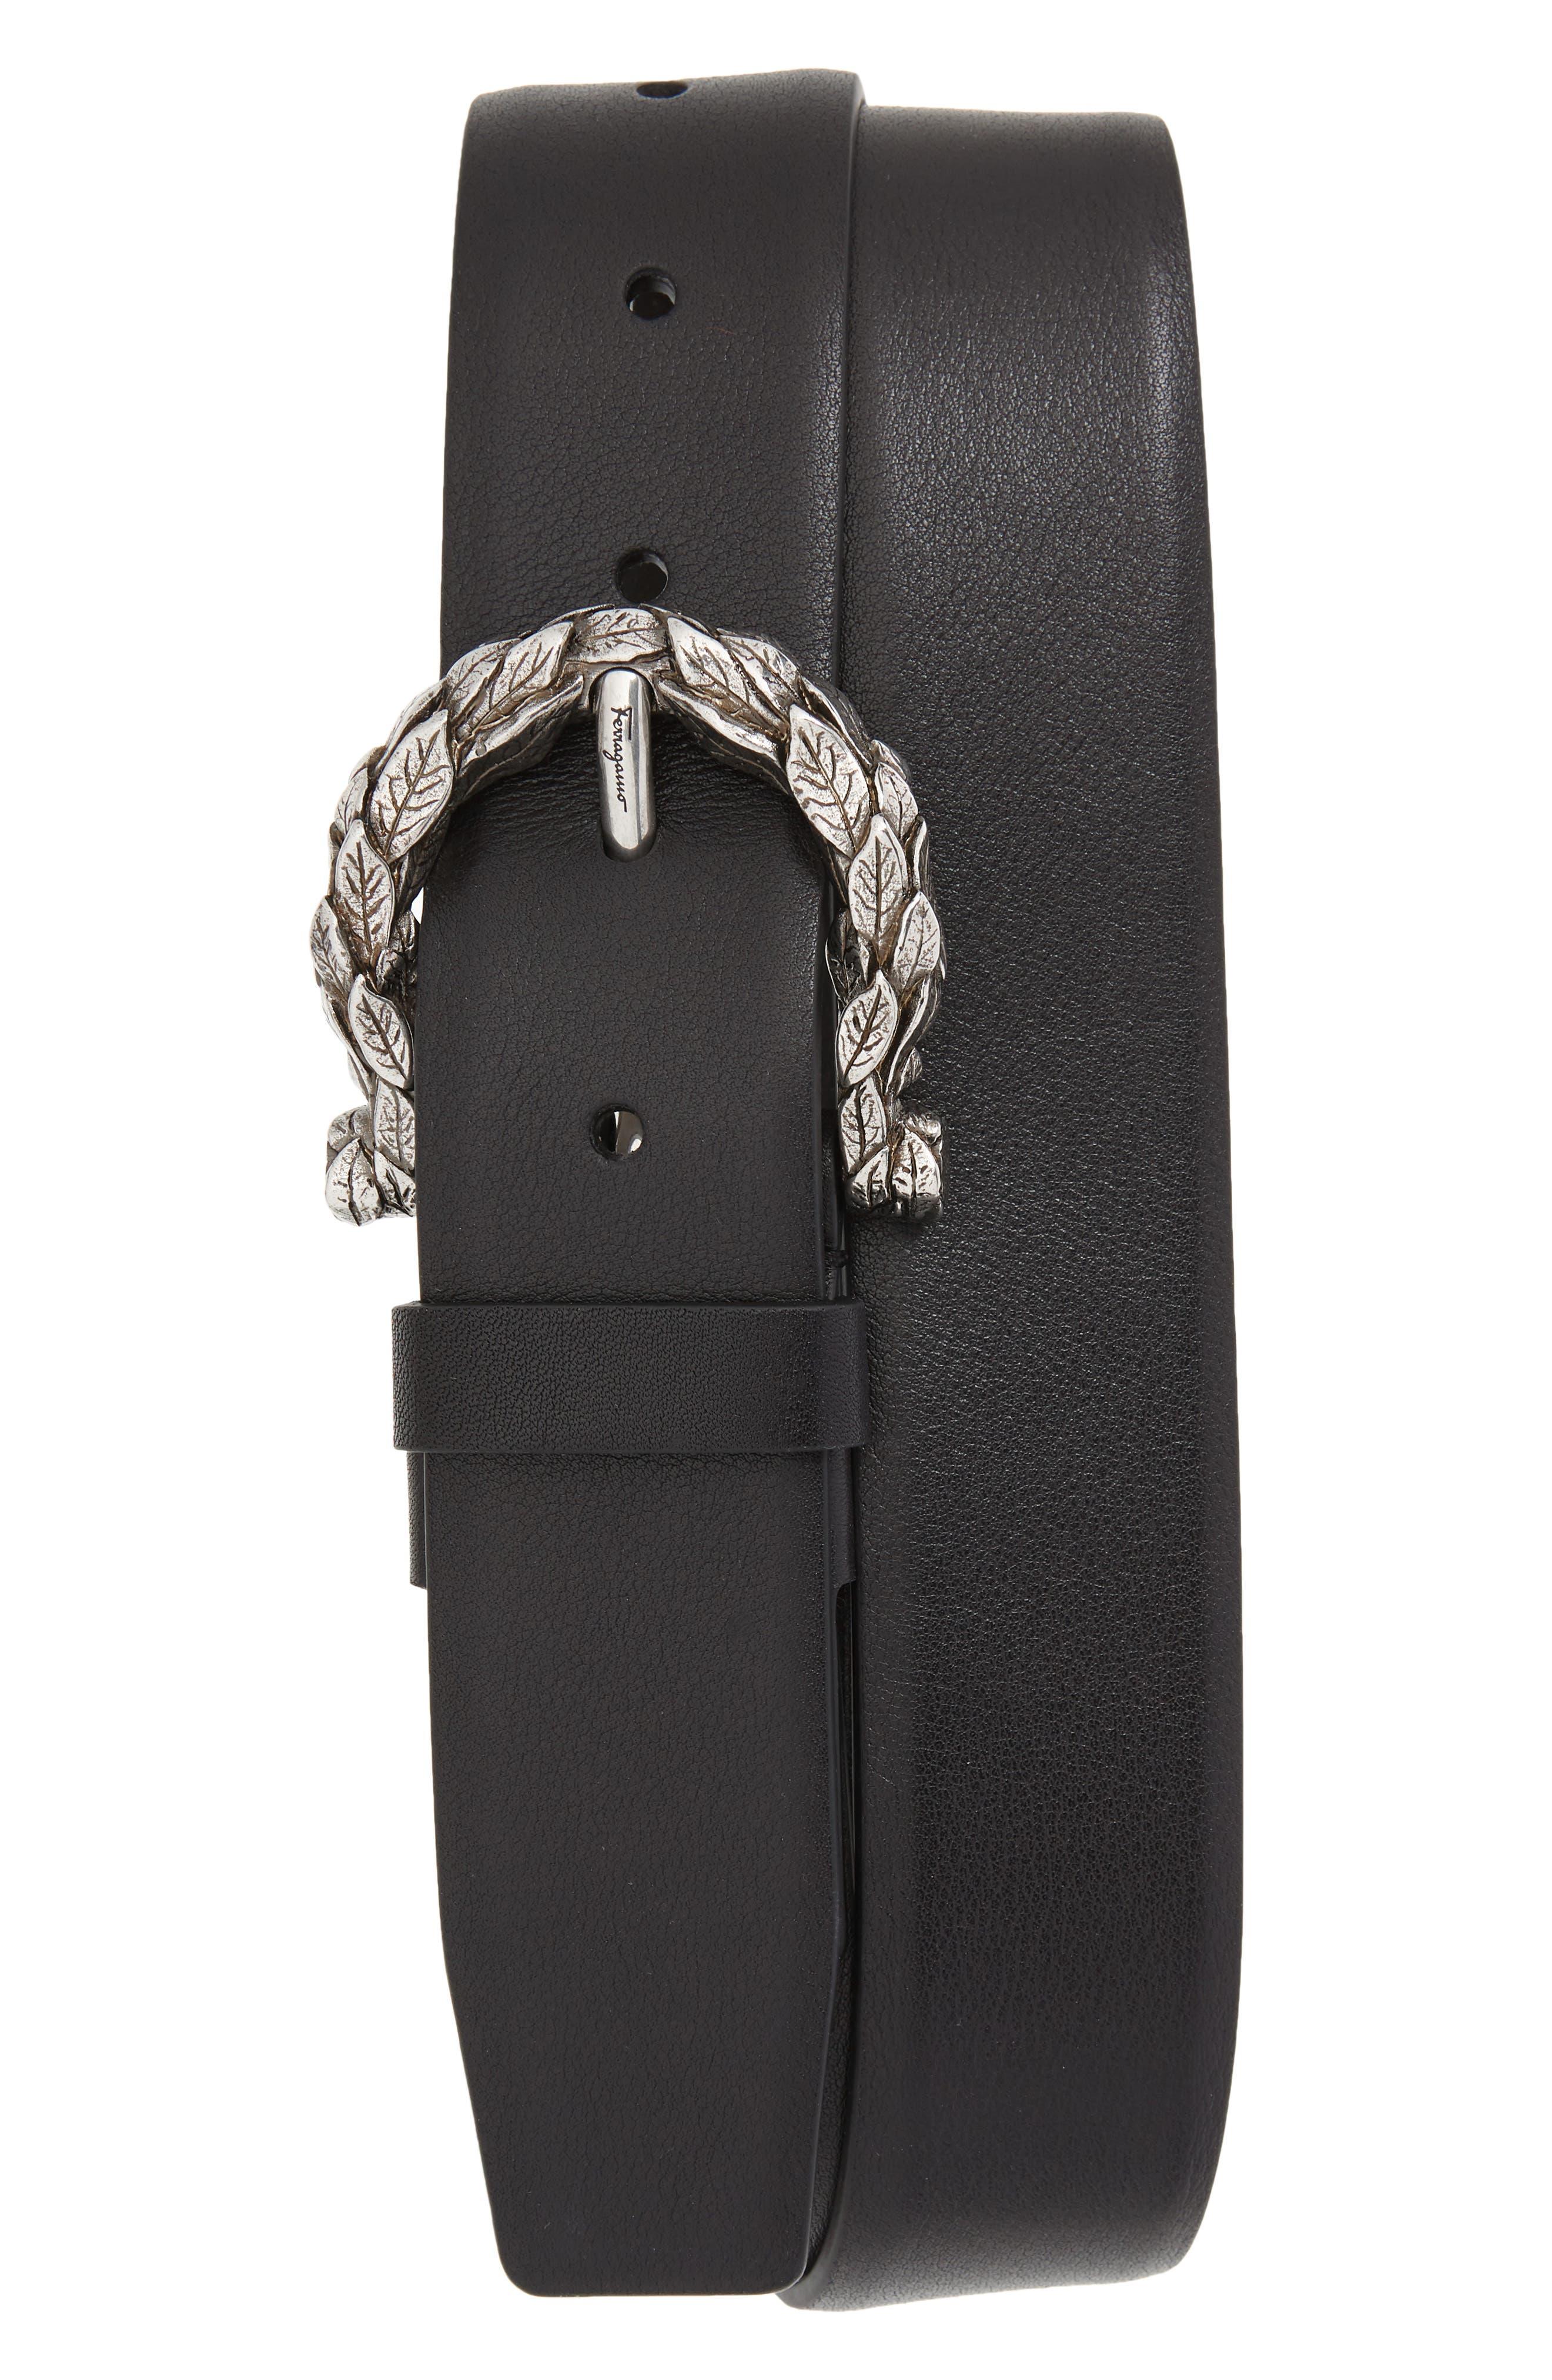 Salvatore Ferragamo Gancio Leaf Buckle Leather Belt